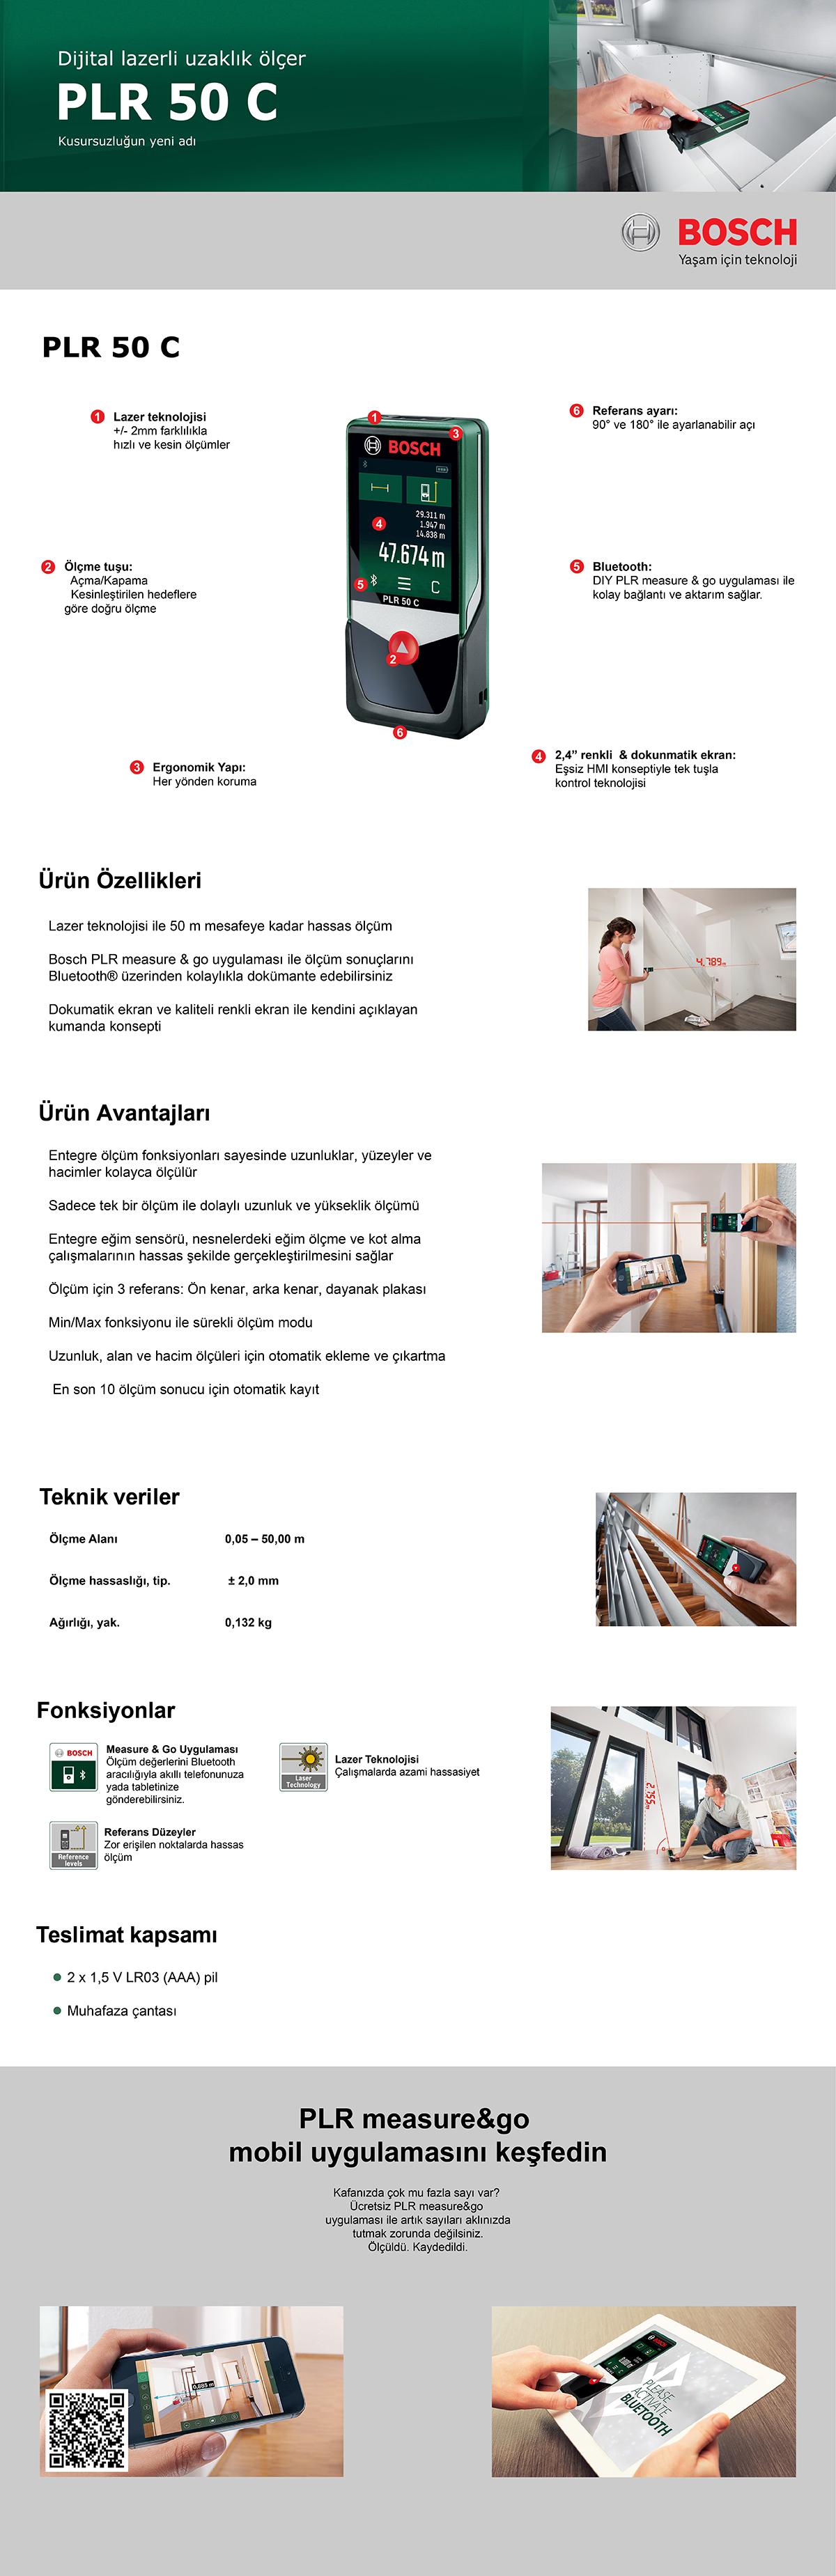 bosch plr 50 c lazerli uzakl k l er fiyat taksit se enekleri. Black Bedroom Furniture Sets. Home Design Ideas